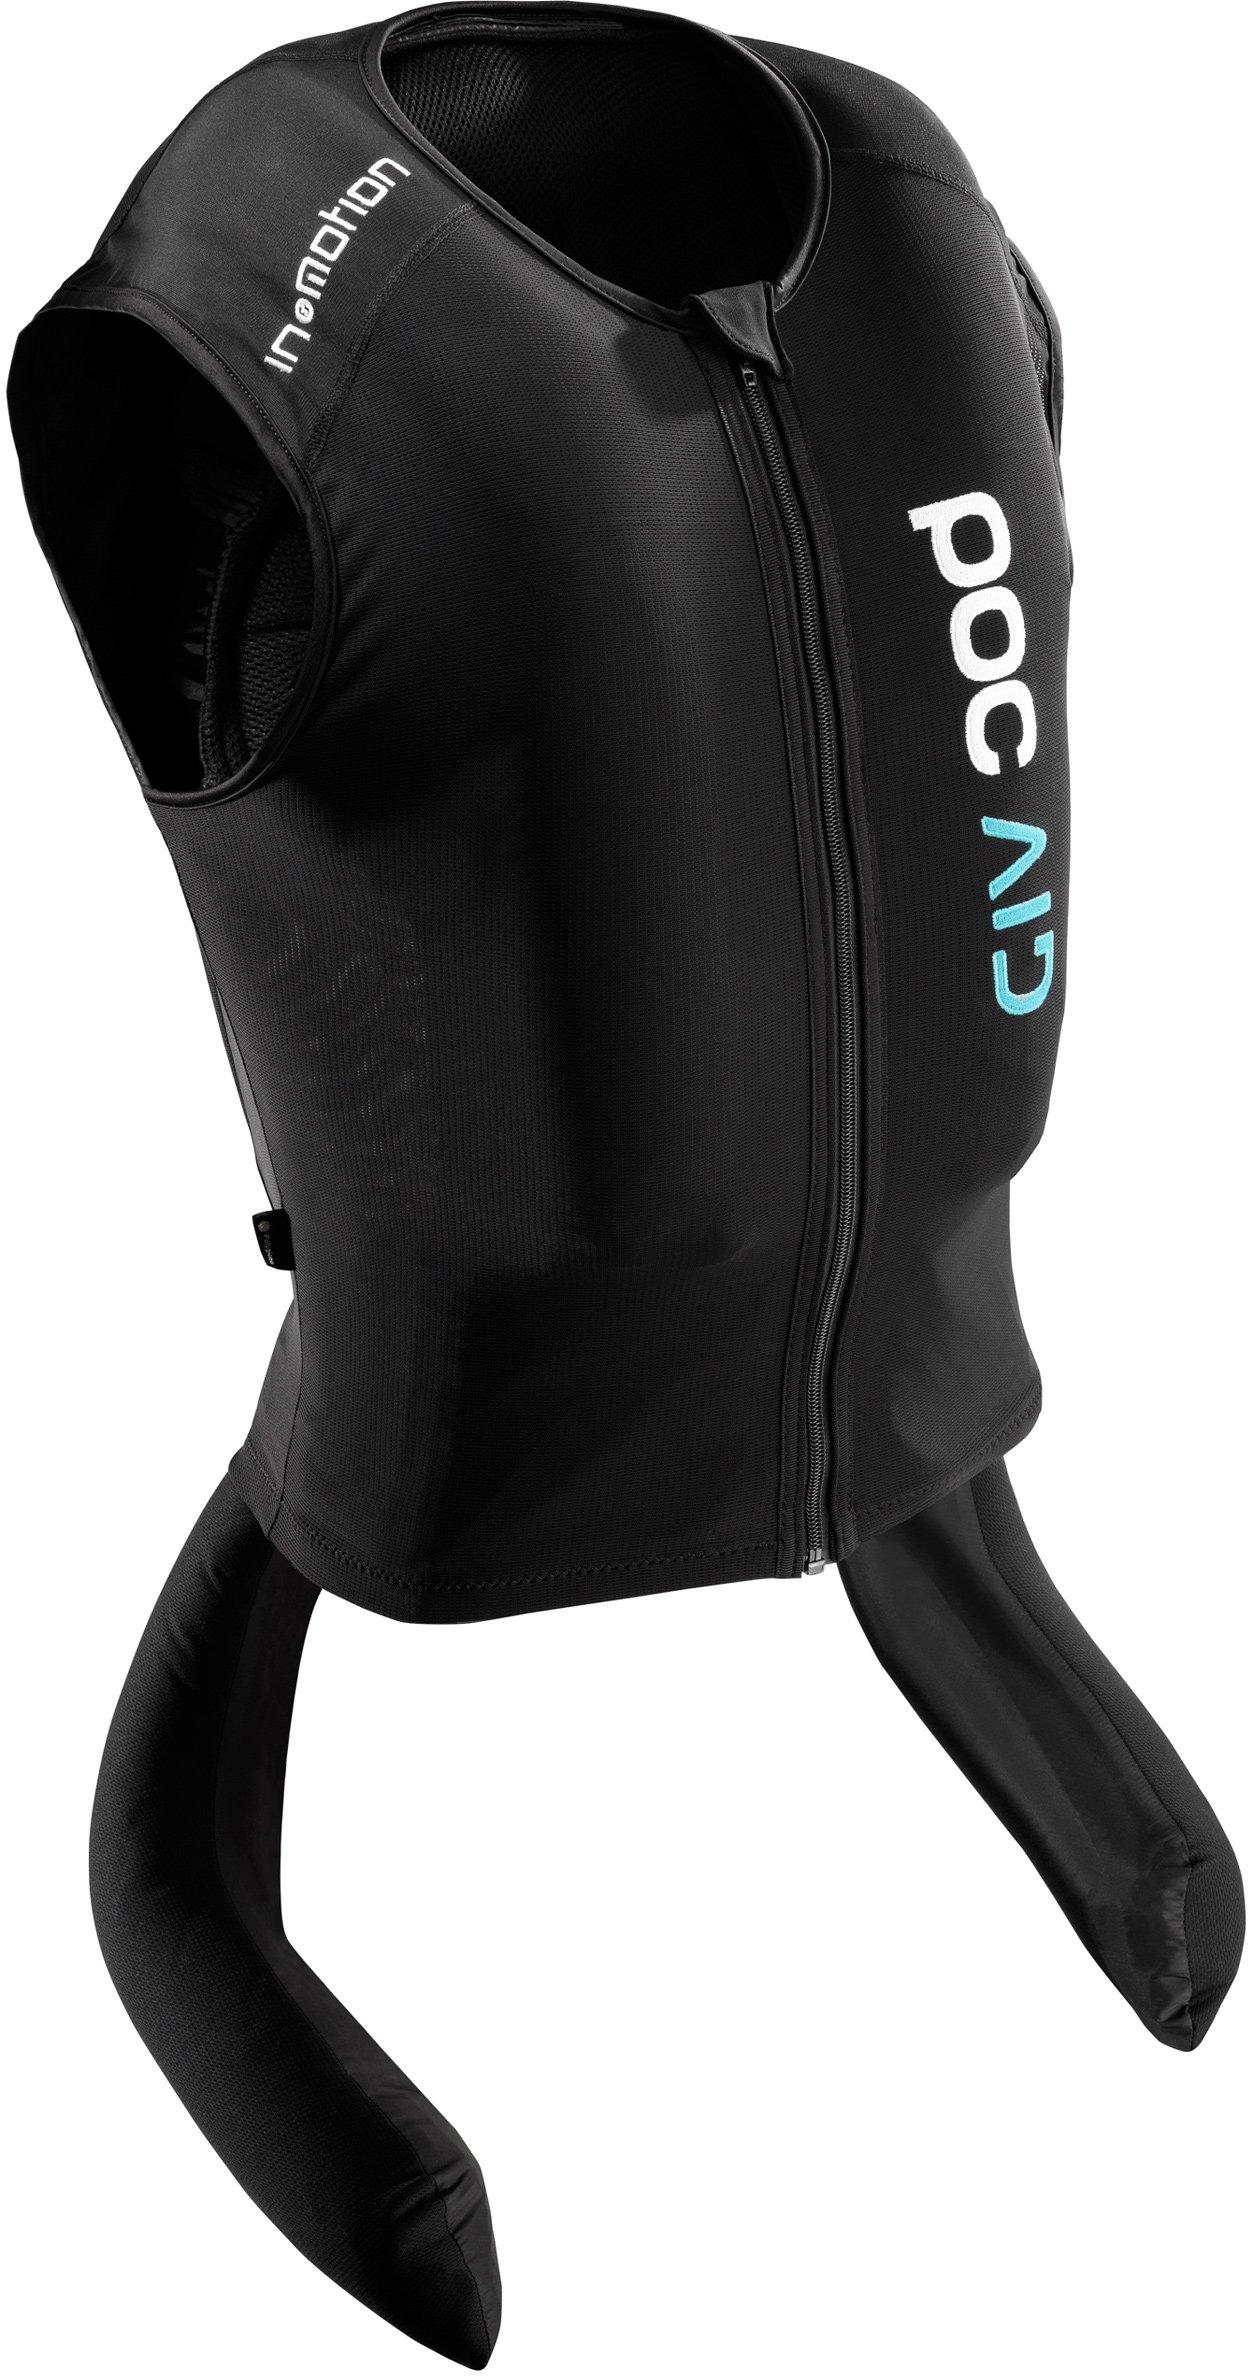 9d6f53745 POC Spine VPD 2.0 Airbag S